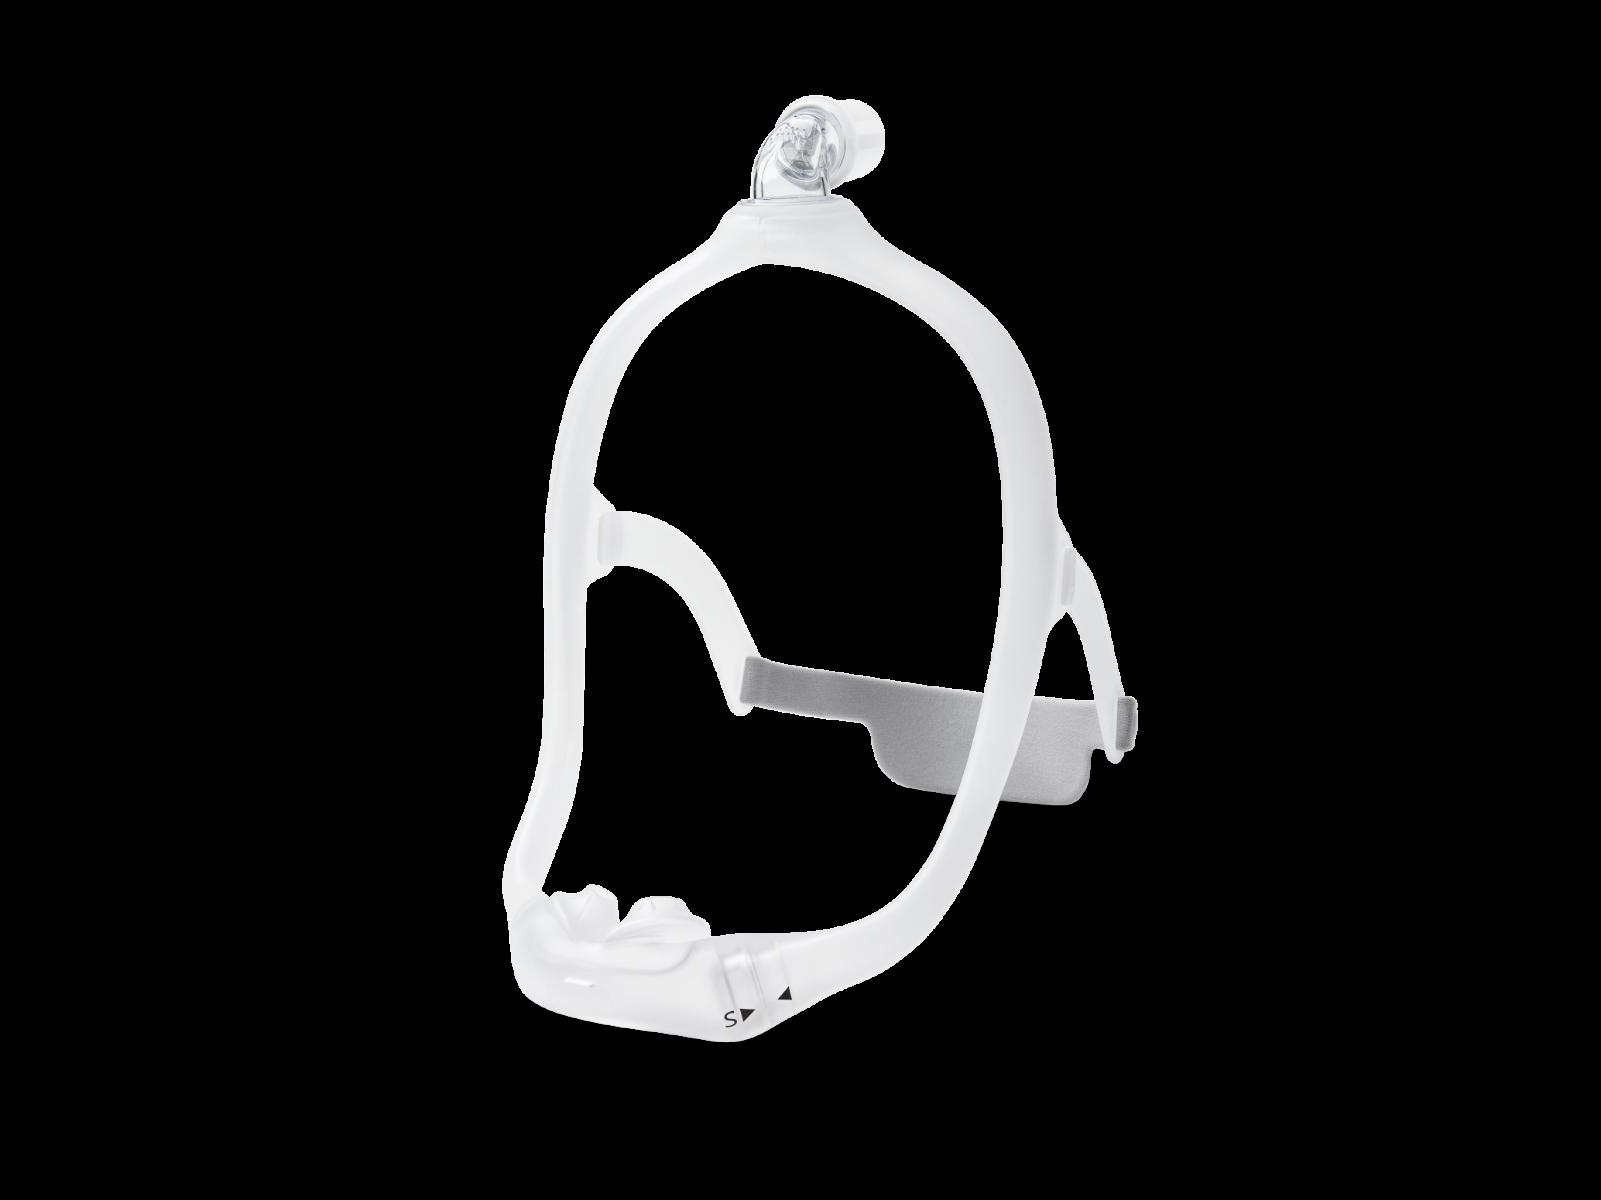 Respironics DreamWear Silicone Nasal Pillows Mask With Headgear